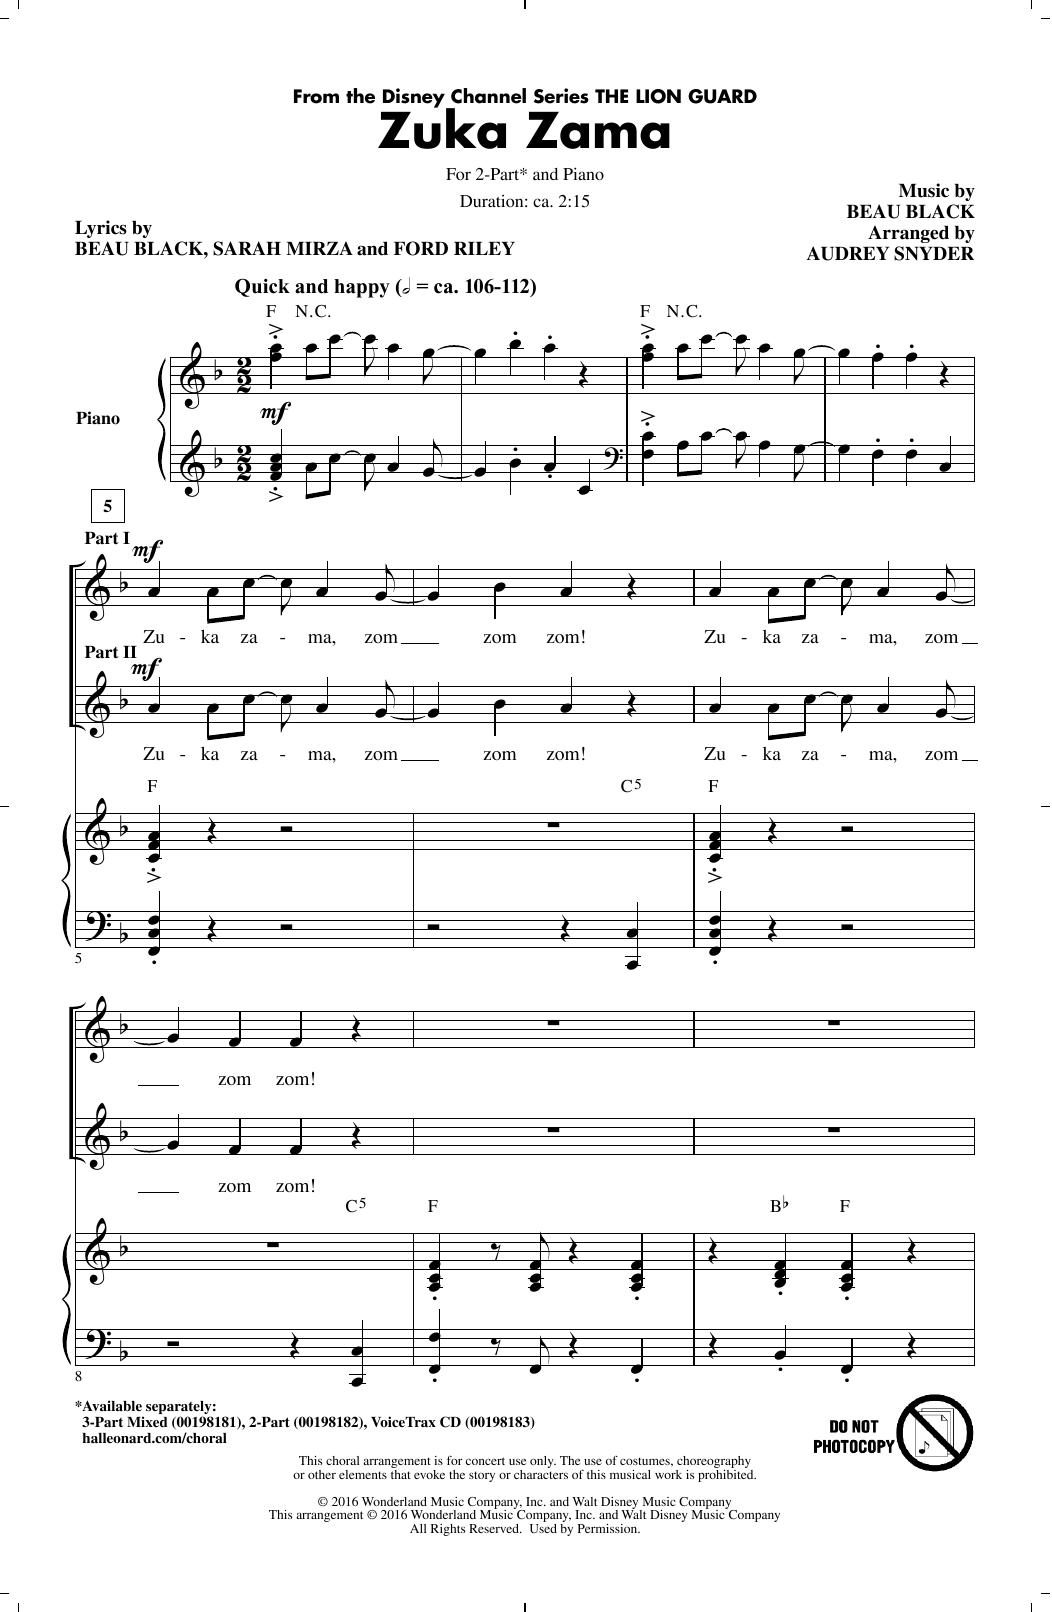 Zuka Zama Sheet Music